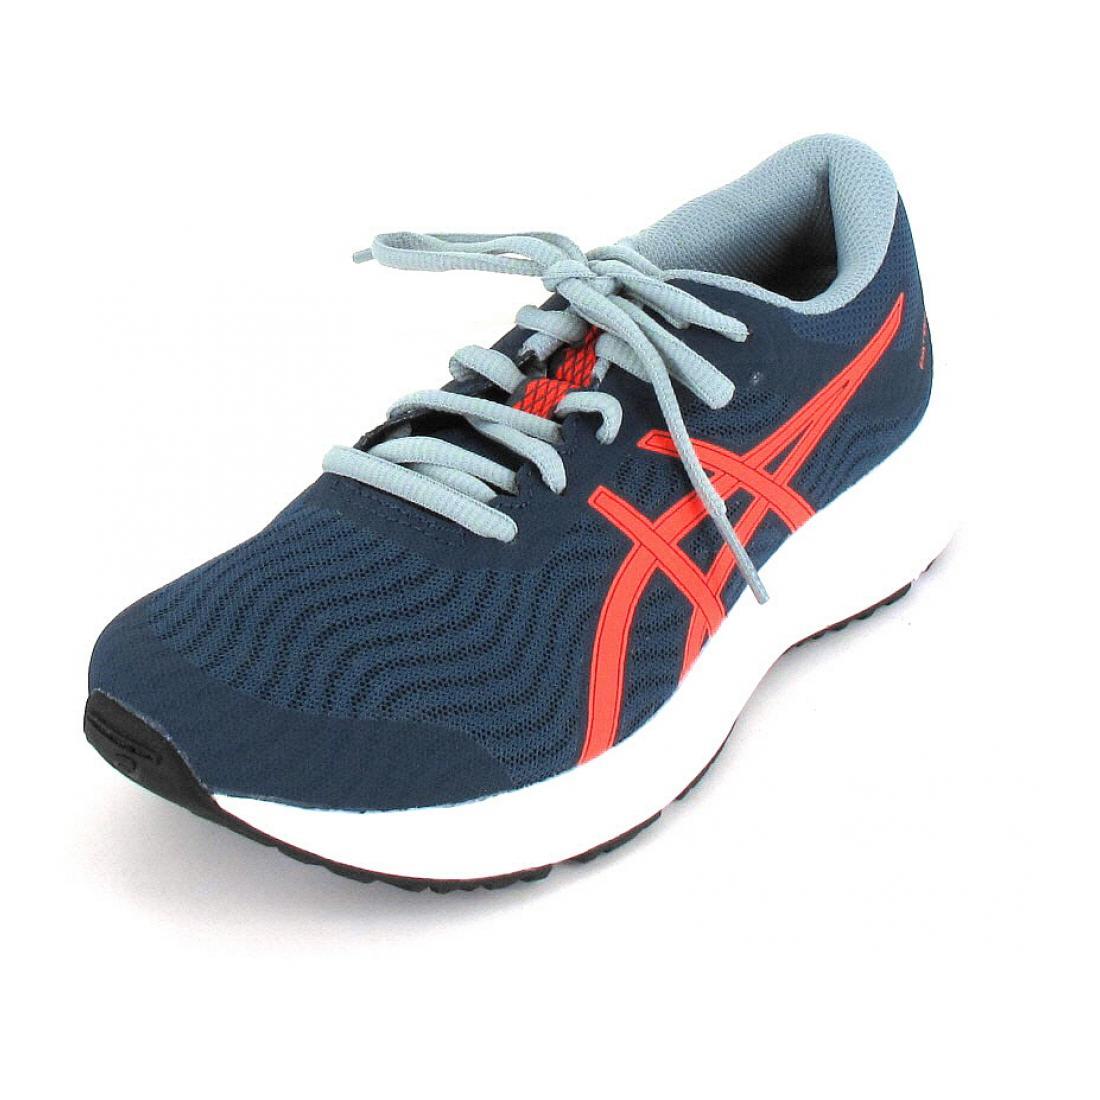 Asics Sneaker PATRIOT 12 GS